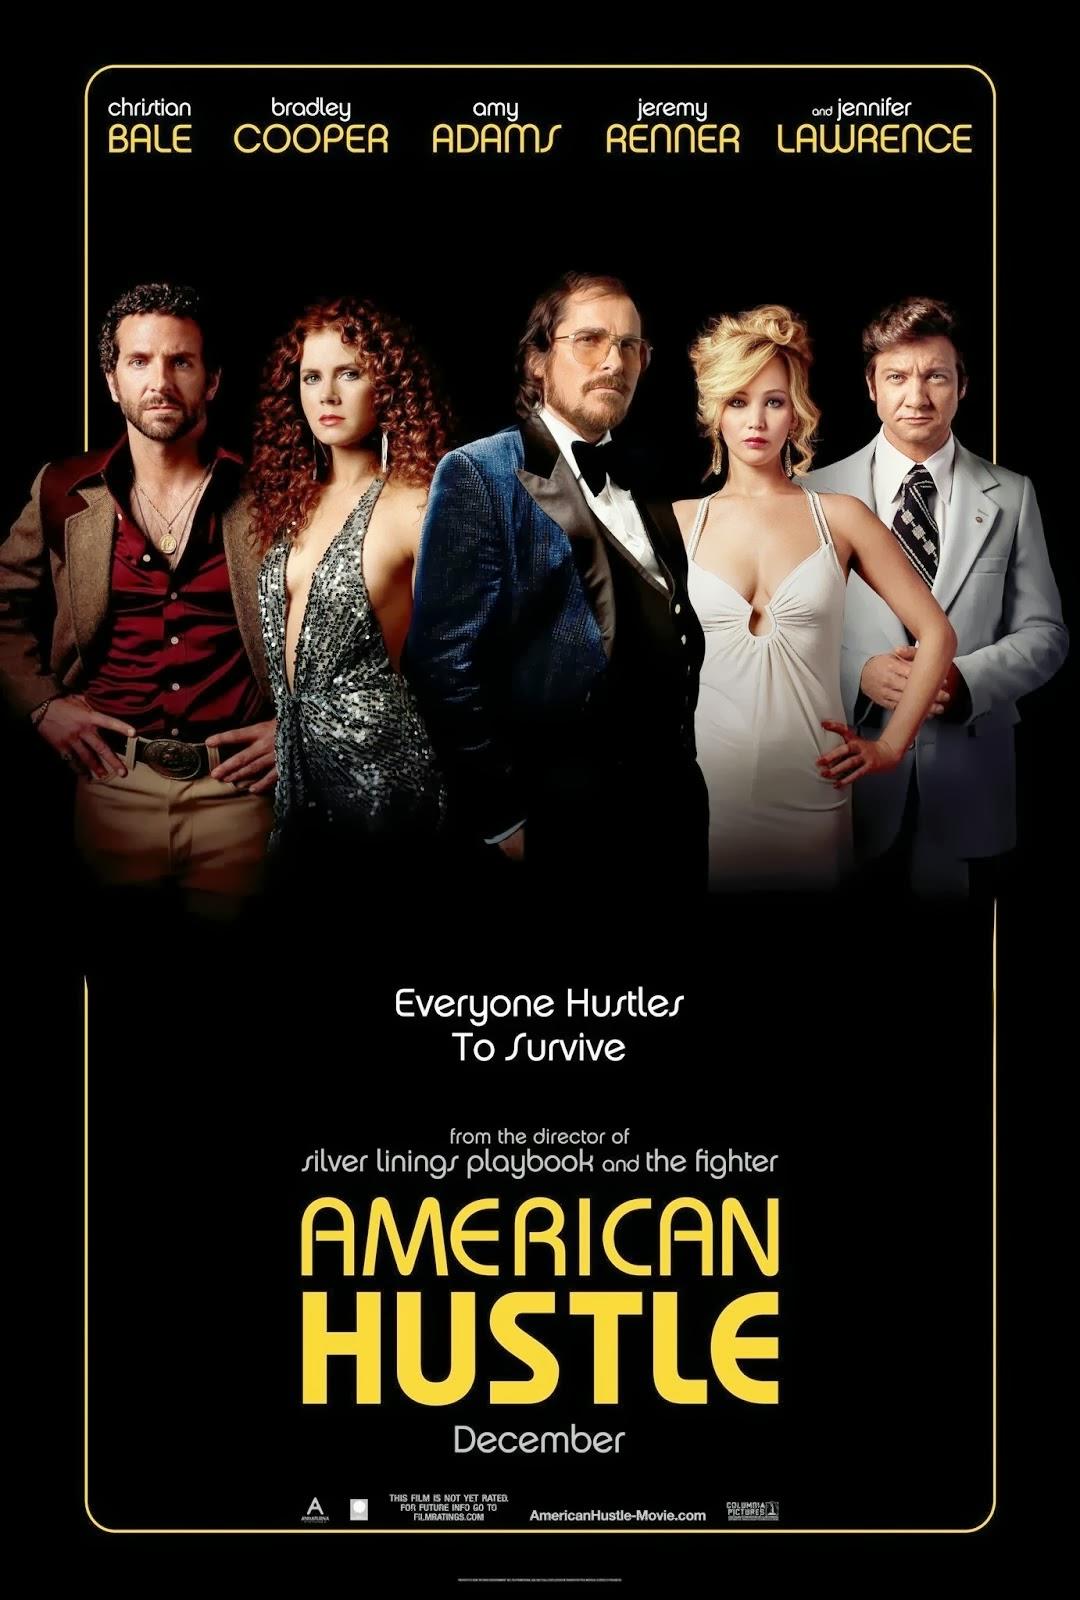 http://2.bp.blogspot.com/-CGwZUrC9ljQ/UnLKk1N19HI/AAAAAAAARVw/7ecVksNBlxk/s1600/American_Hustle_New_Poster_Oficial_JPosters.jpg